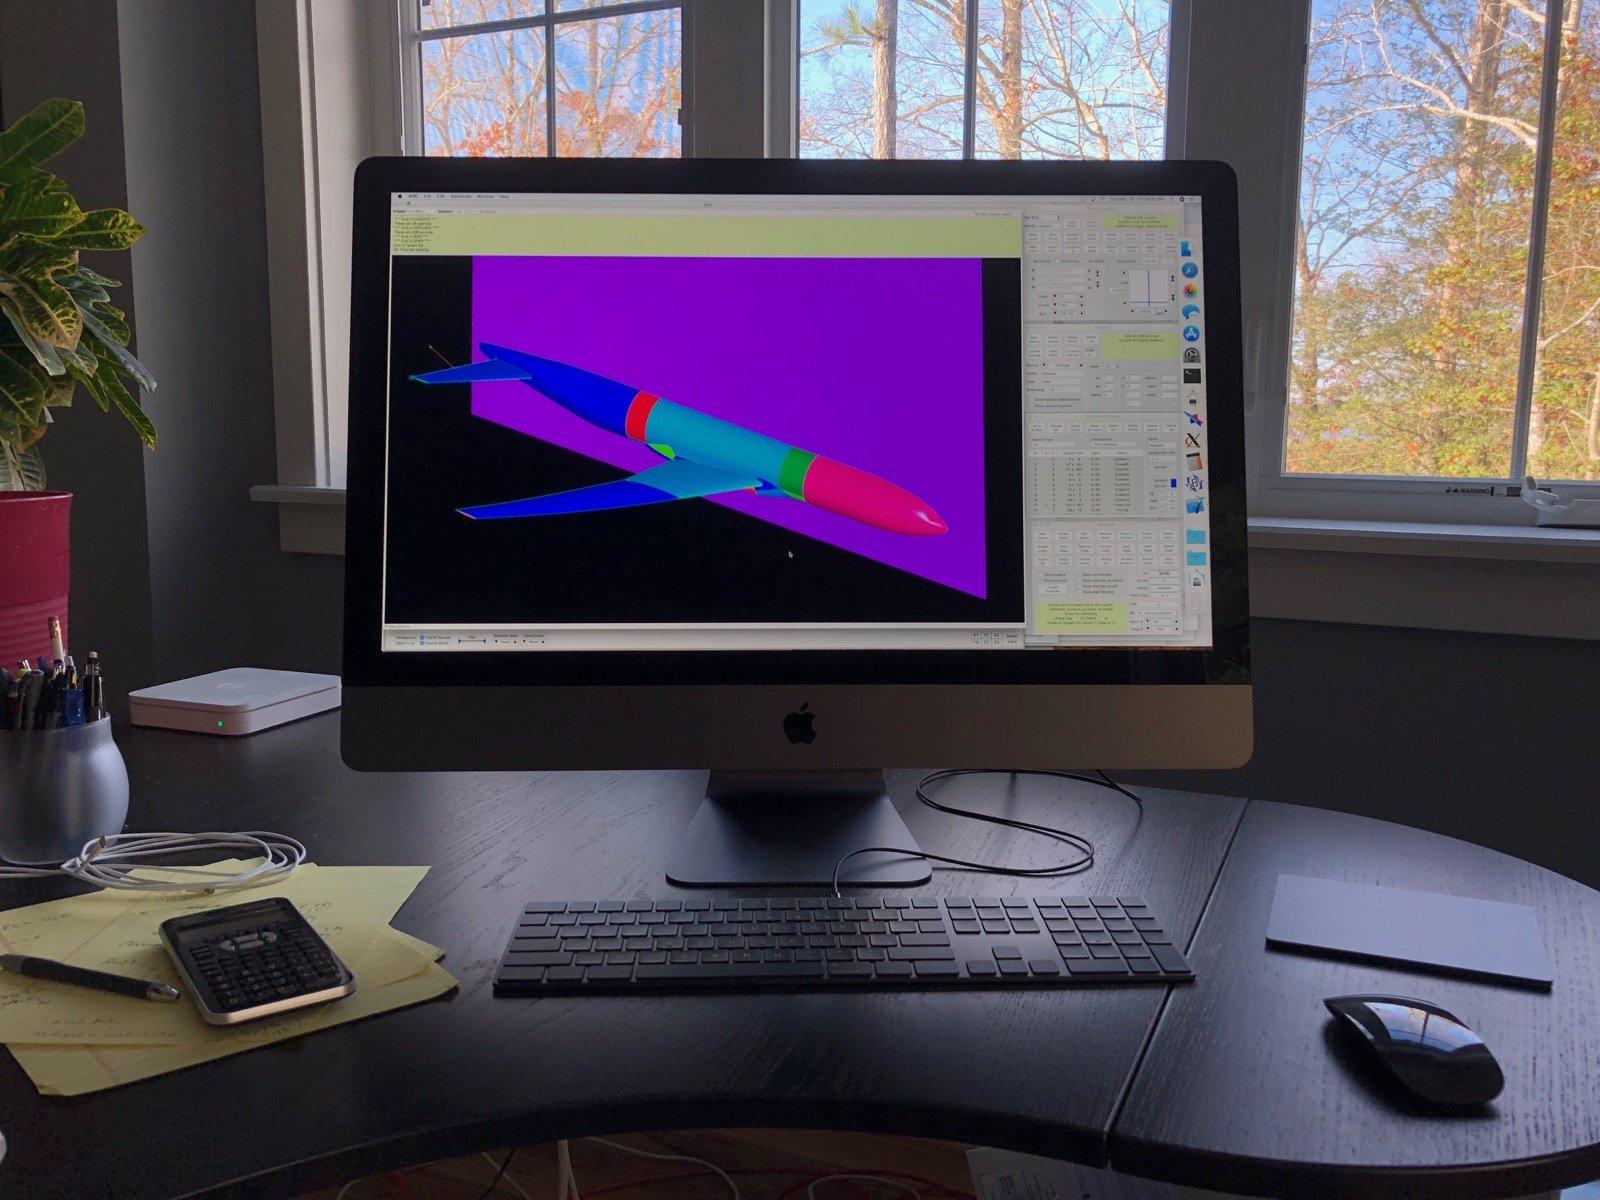 Thunderbolt Raid Systems Imac Pro Of 2019 Imore